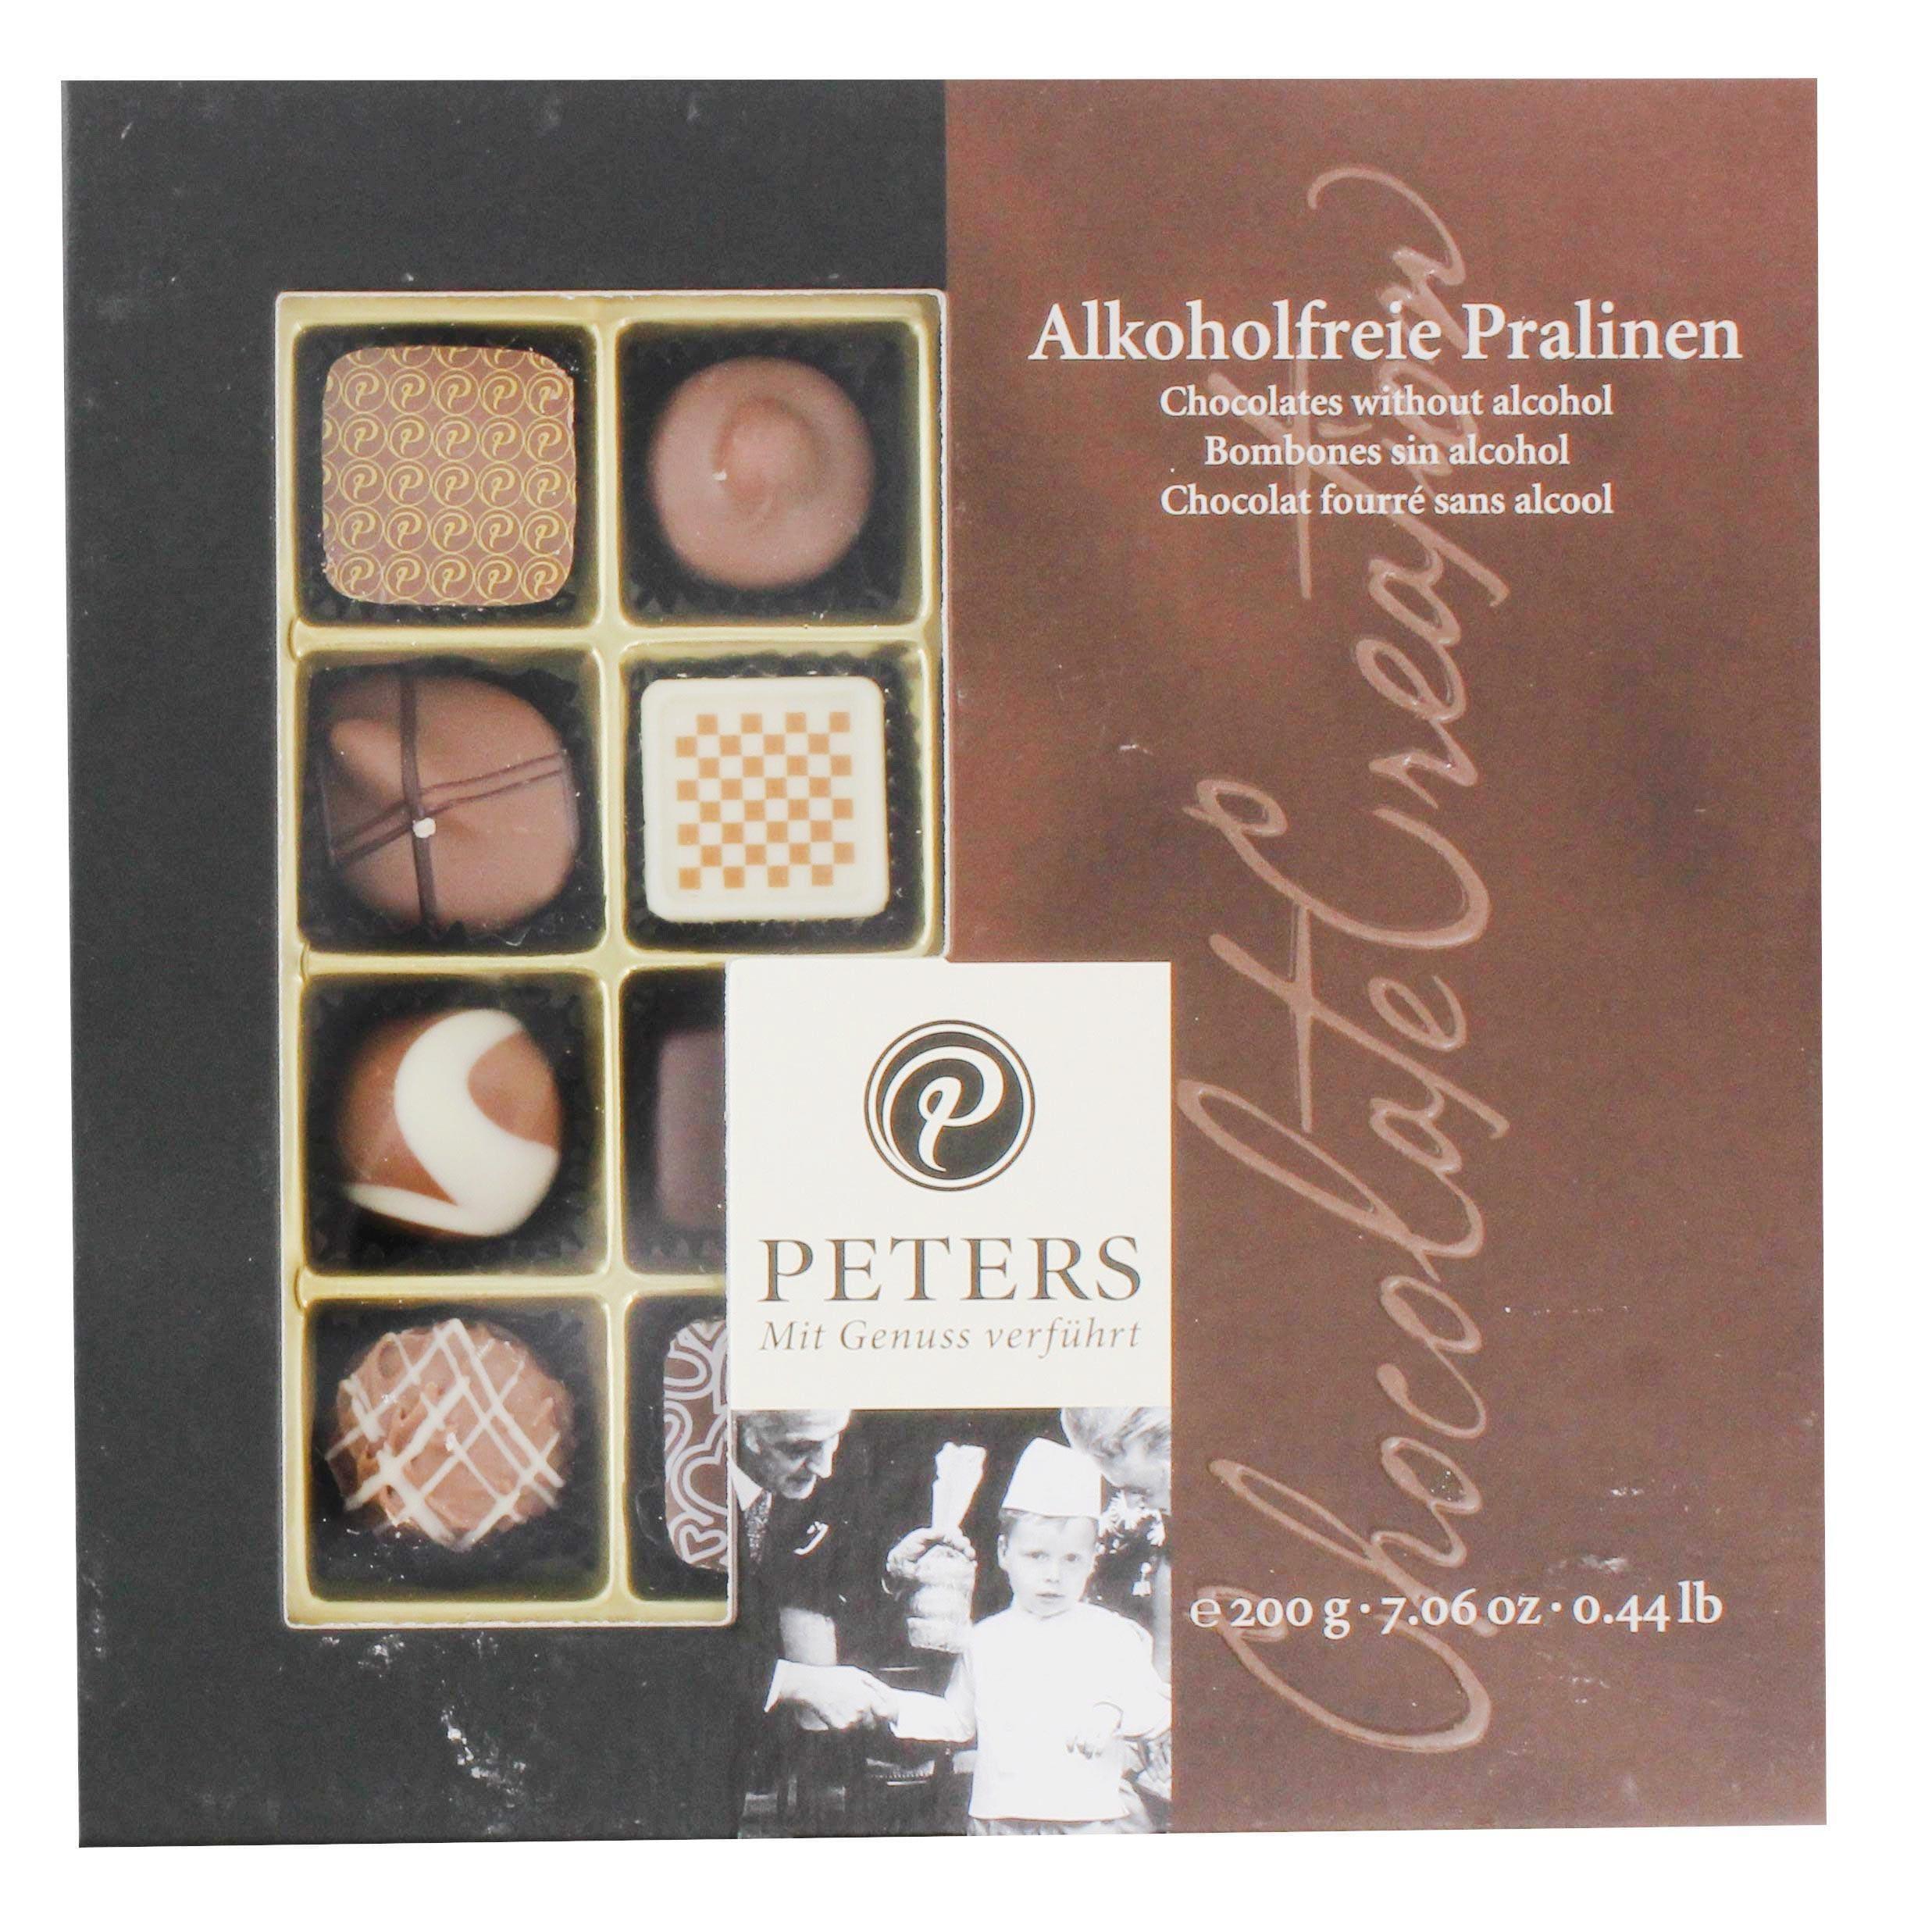 Peters - Alkoholfreie Pralinen Confiserie - 200g